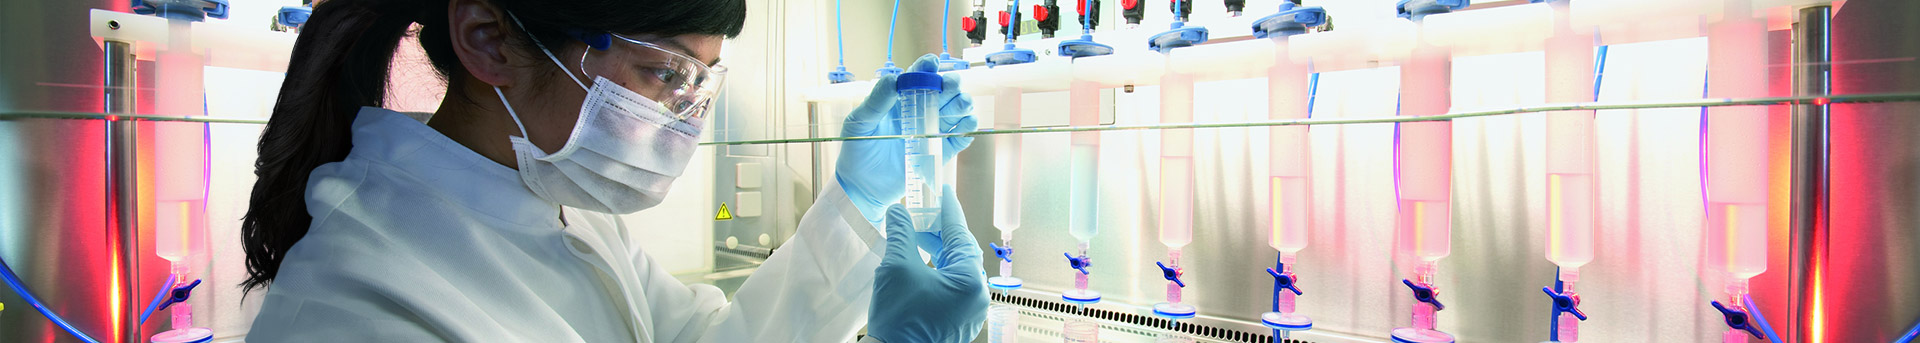 Věda, výzkum a farmaceutický průmysl